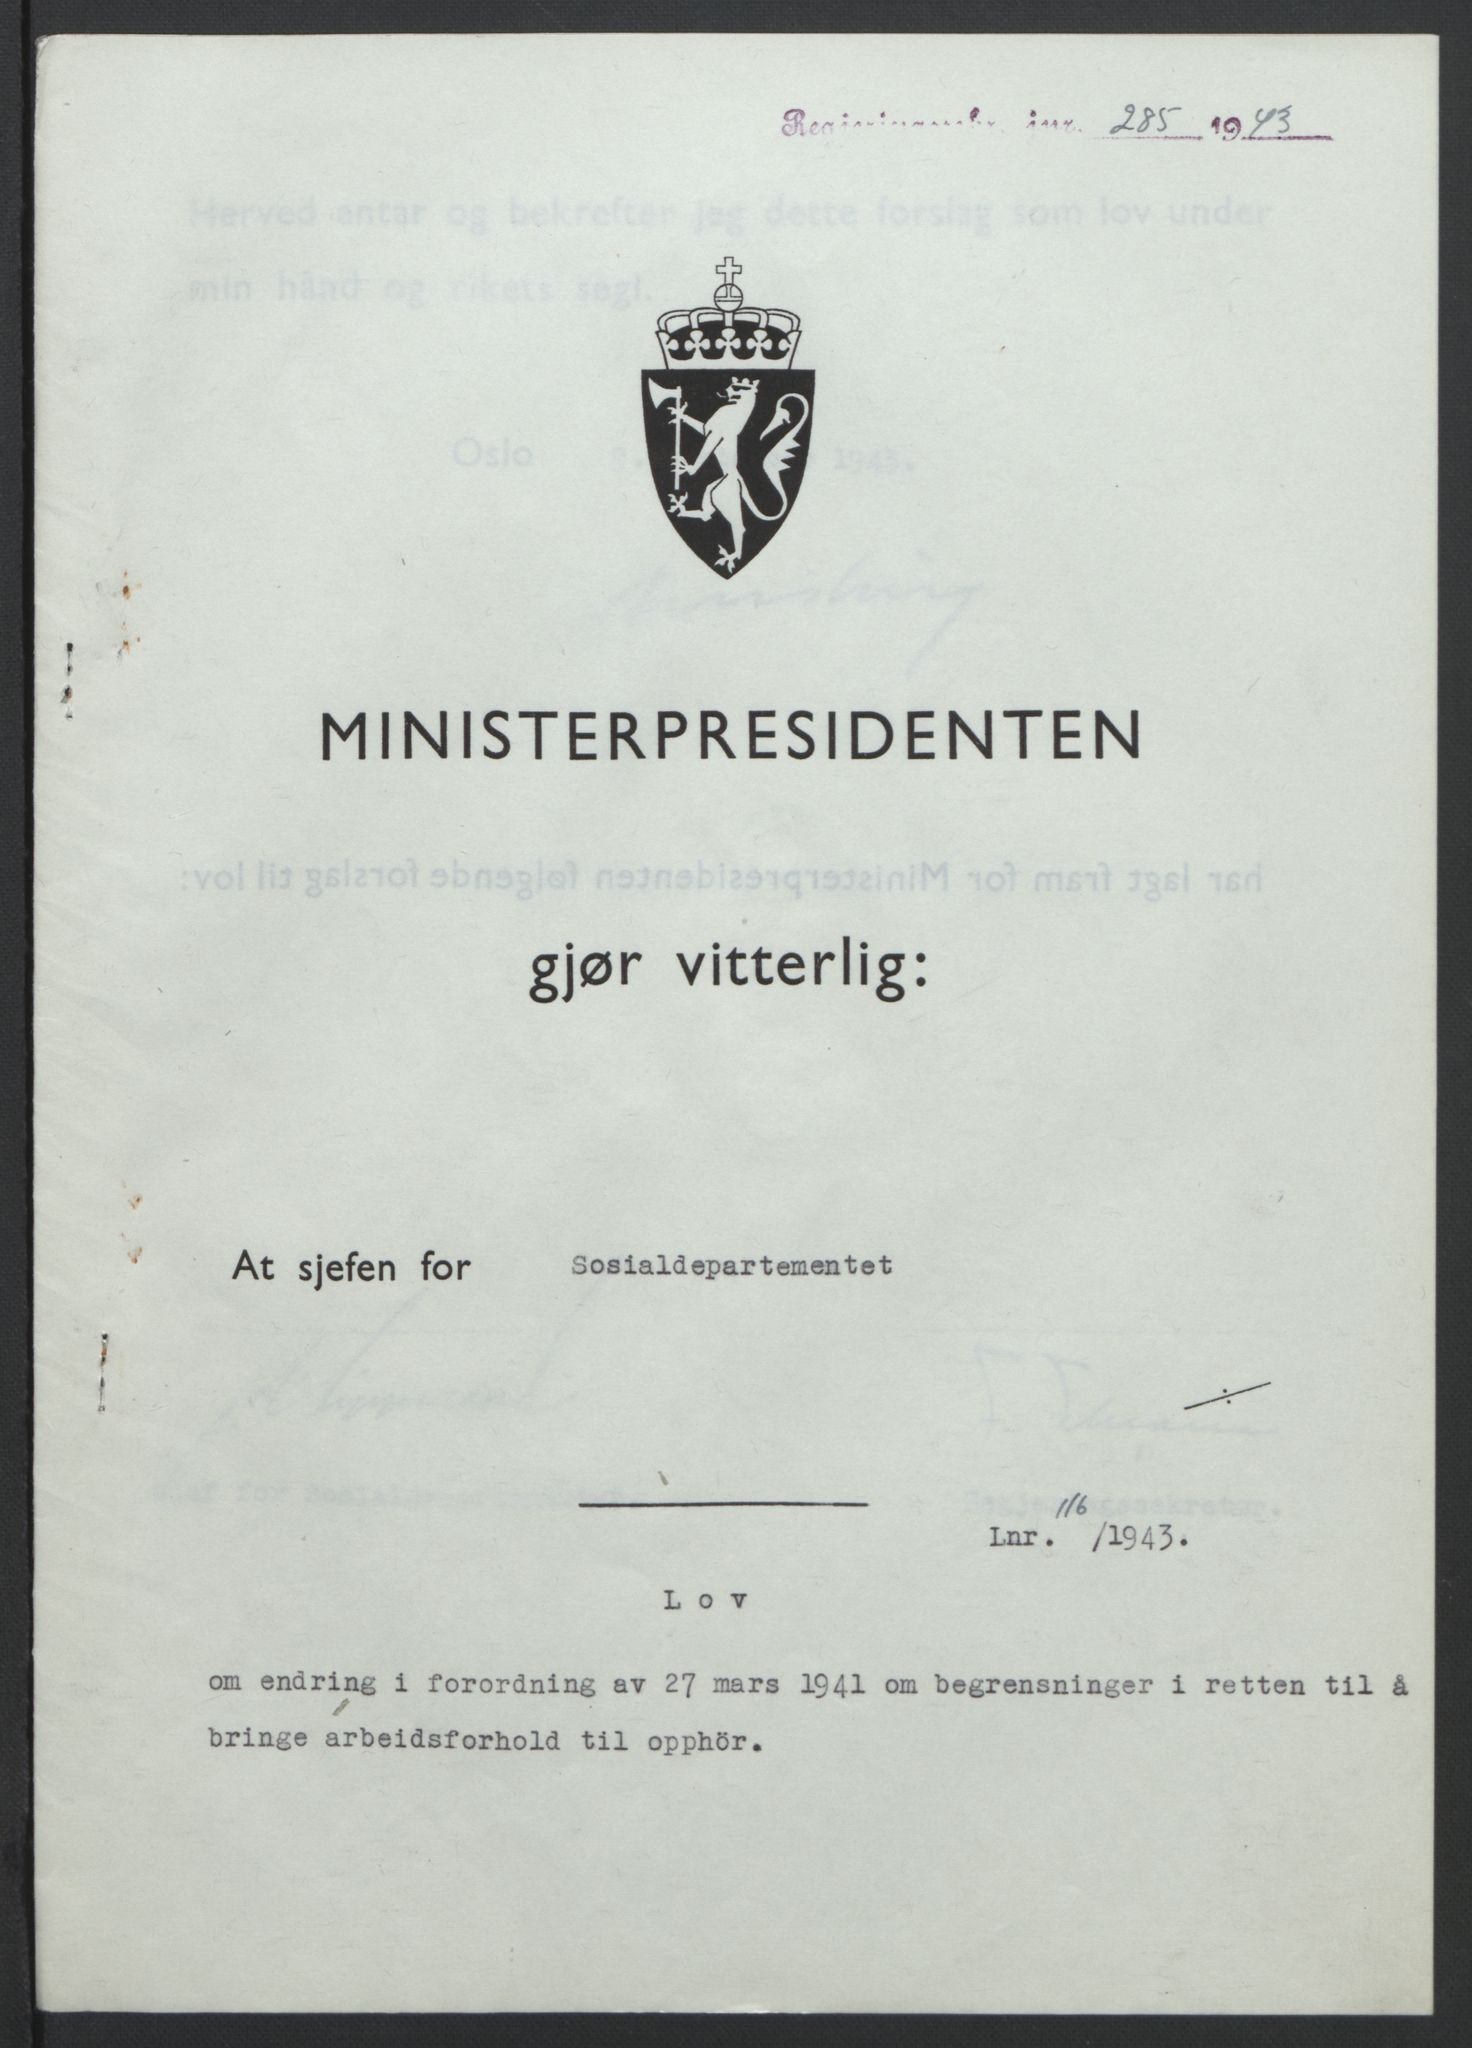 RA, NS-administrasjonen 1940-1945 (Statsrådsekretariatet, de kommisariske statsråder mm), D/Db/L0099: Lover, 1943, s. 540